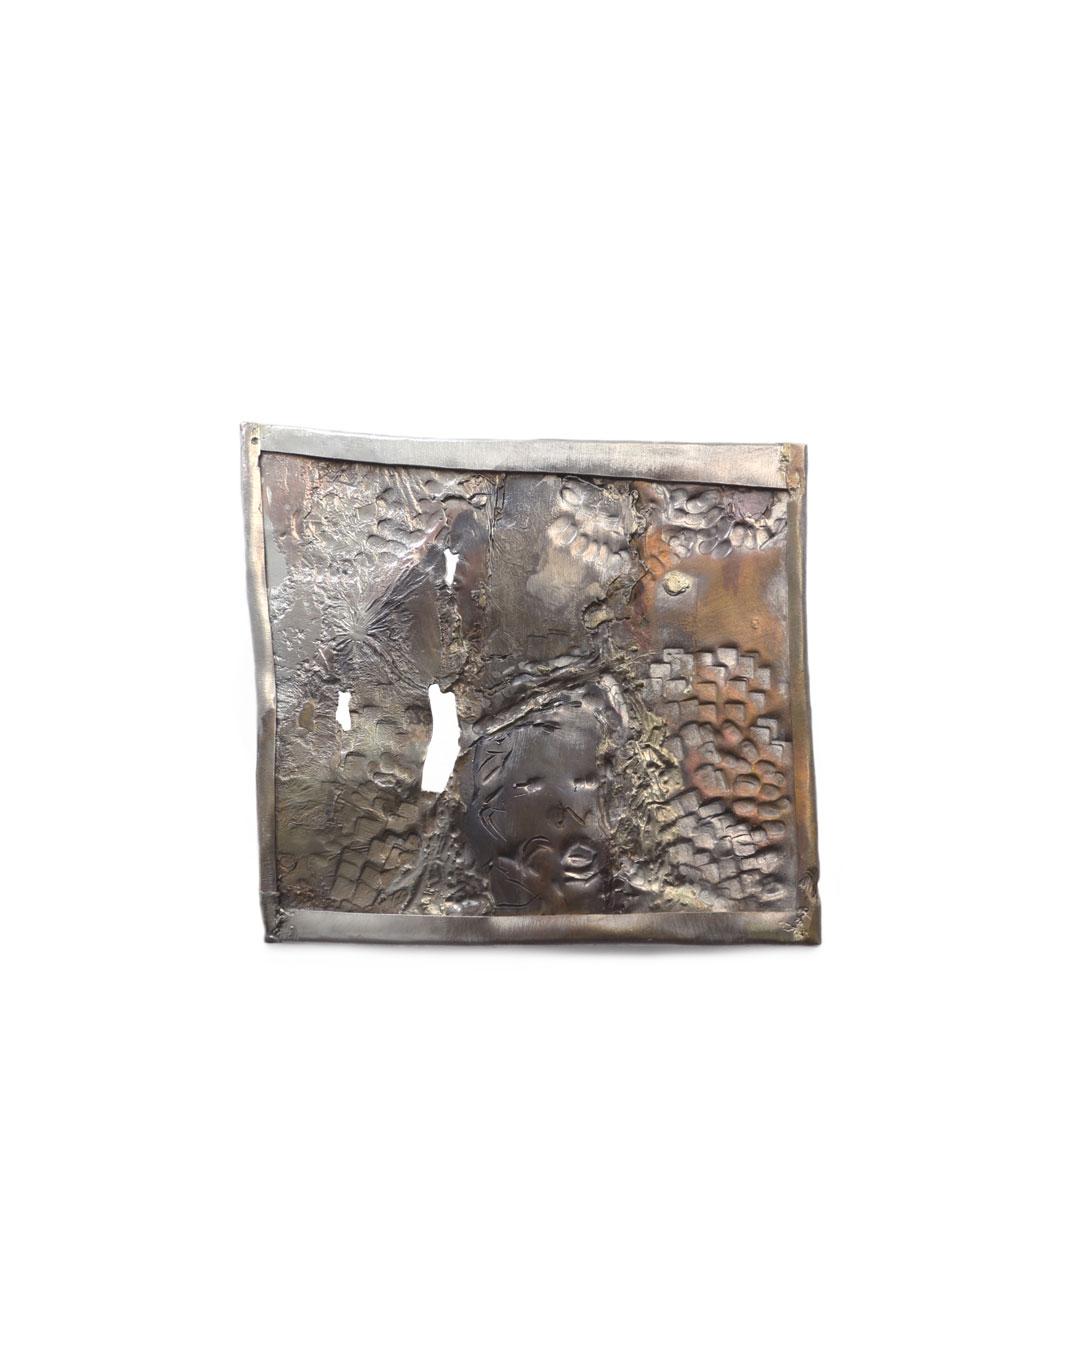 Rudolf Kocéa, Oh Donald, 2016, brooch; silver, copper, gold, 100 x 130 mm, €2000